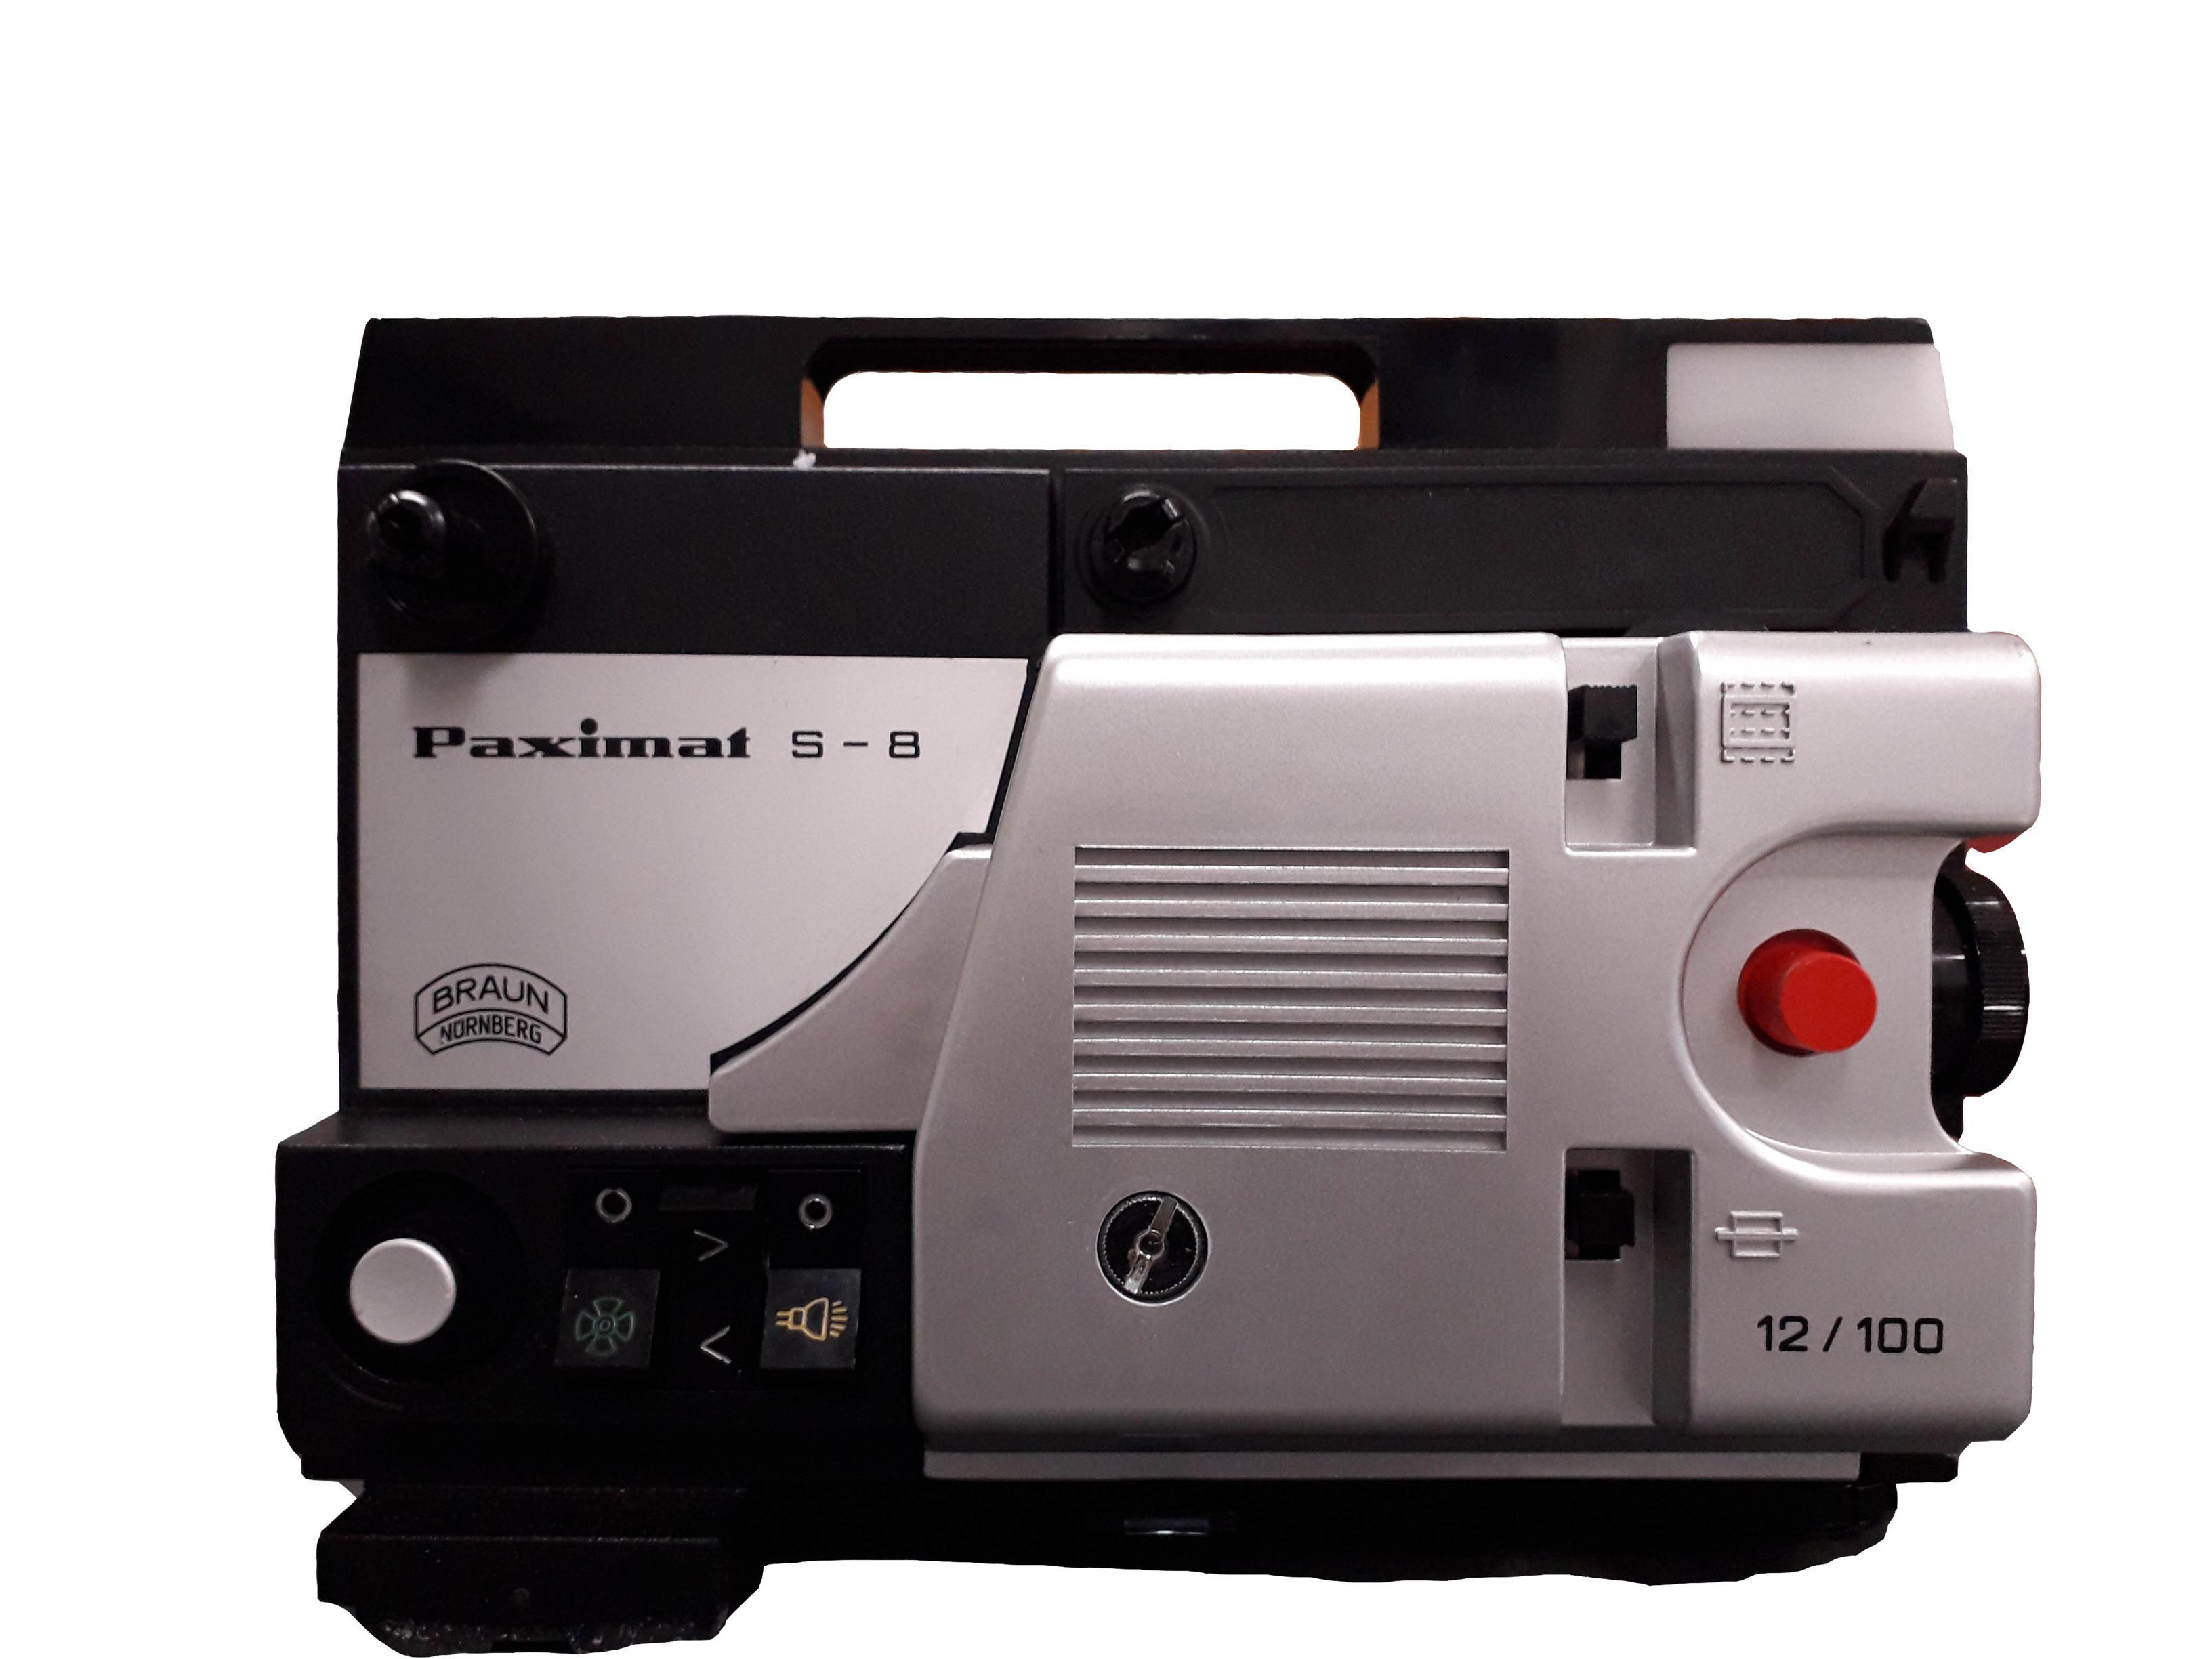 Paximat s-8 12 100 - Model B